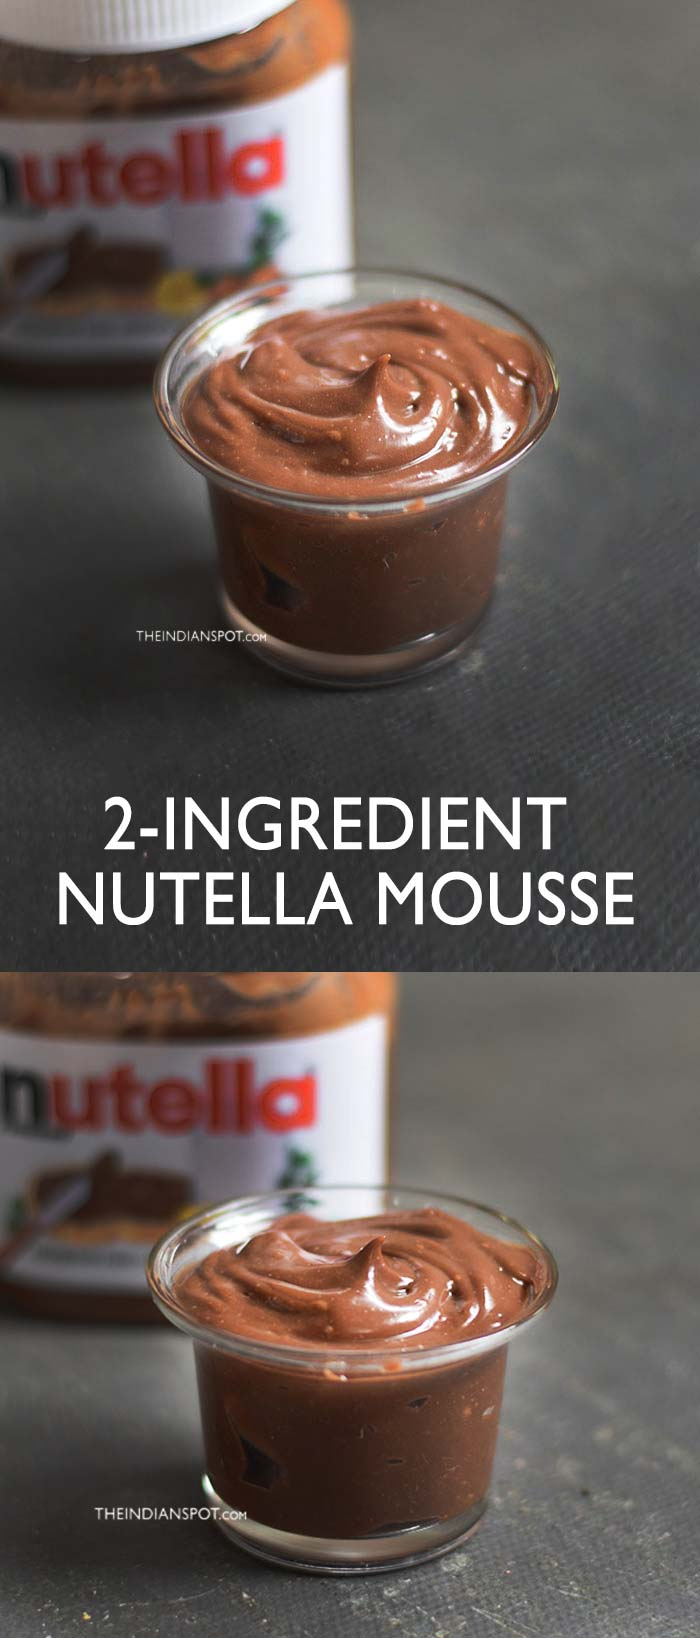 2-INGREDIENT NUTELLA MOUSSE